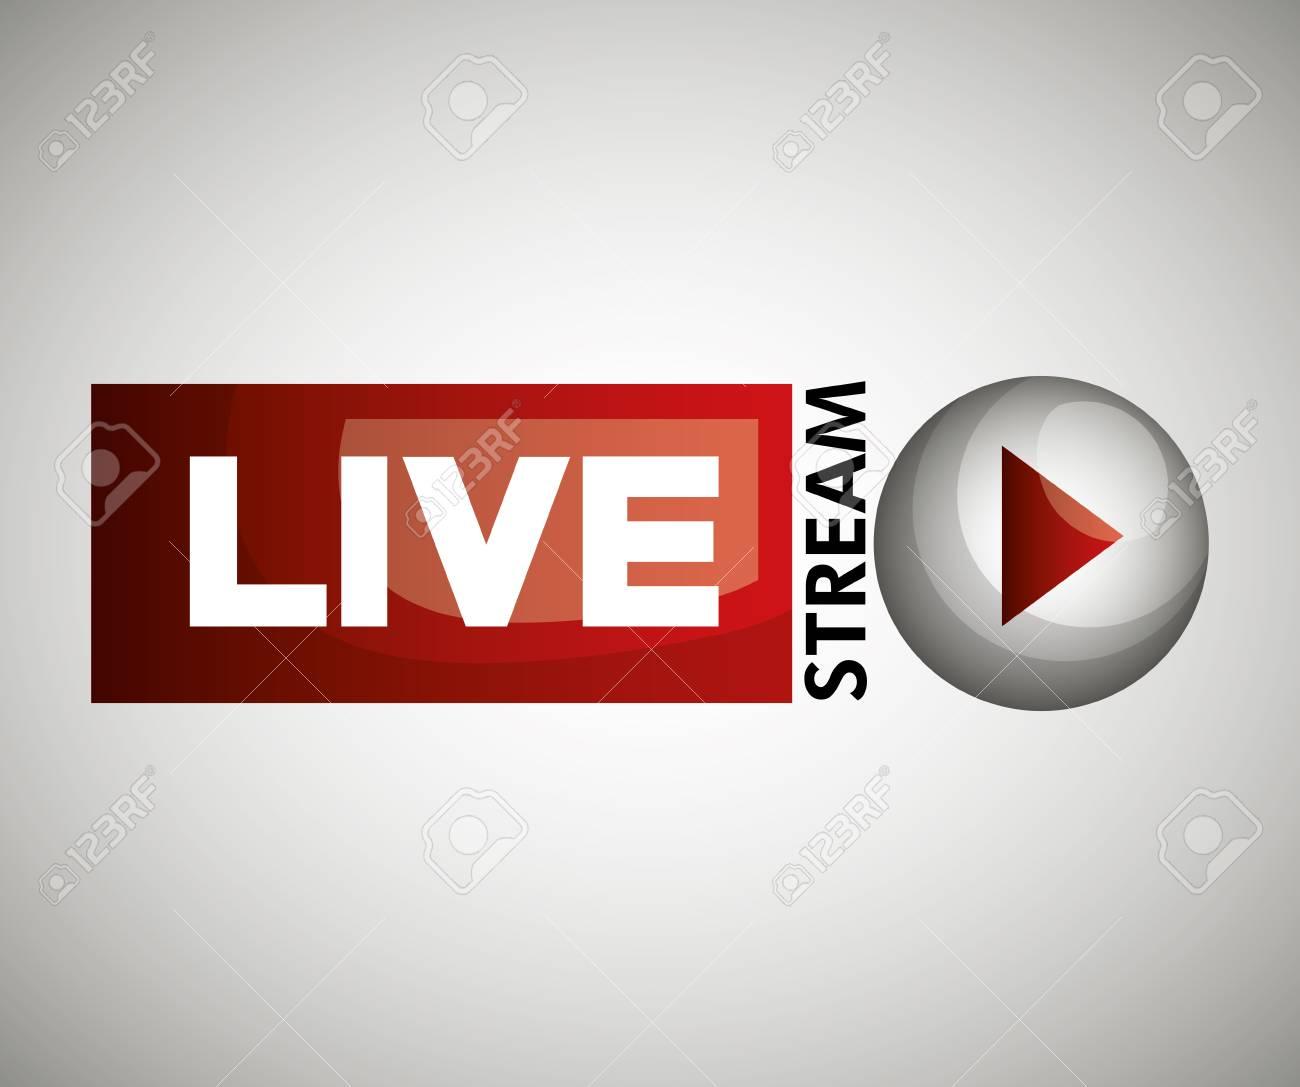 button icon live streaming design graphic vector illustration - 63080320